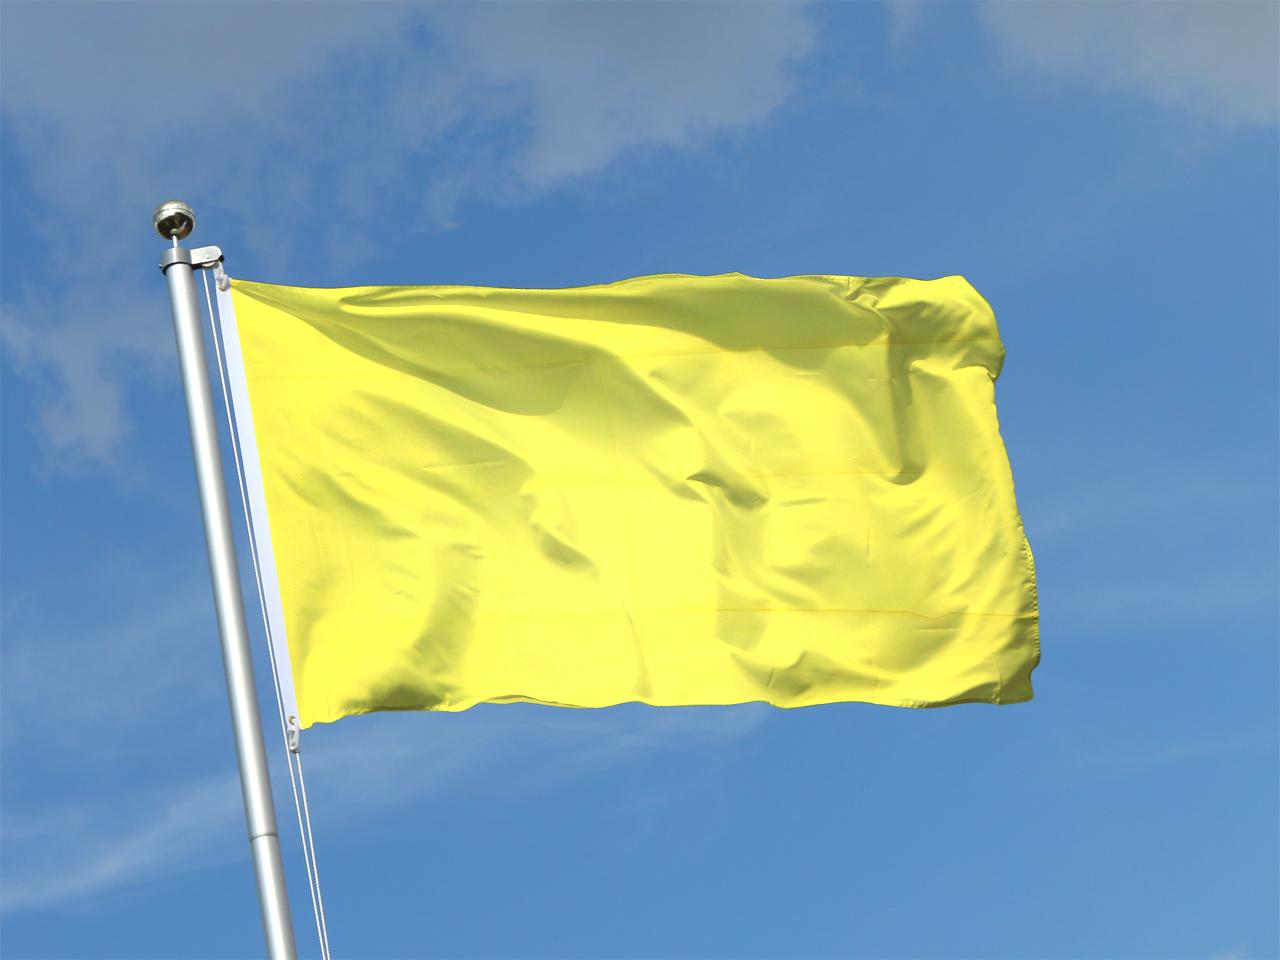 Gelbe Flagge - Gelbe Fahne kaufen - FlaggenPlatz Shop